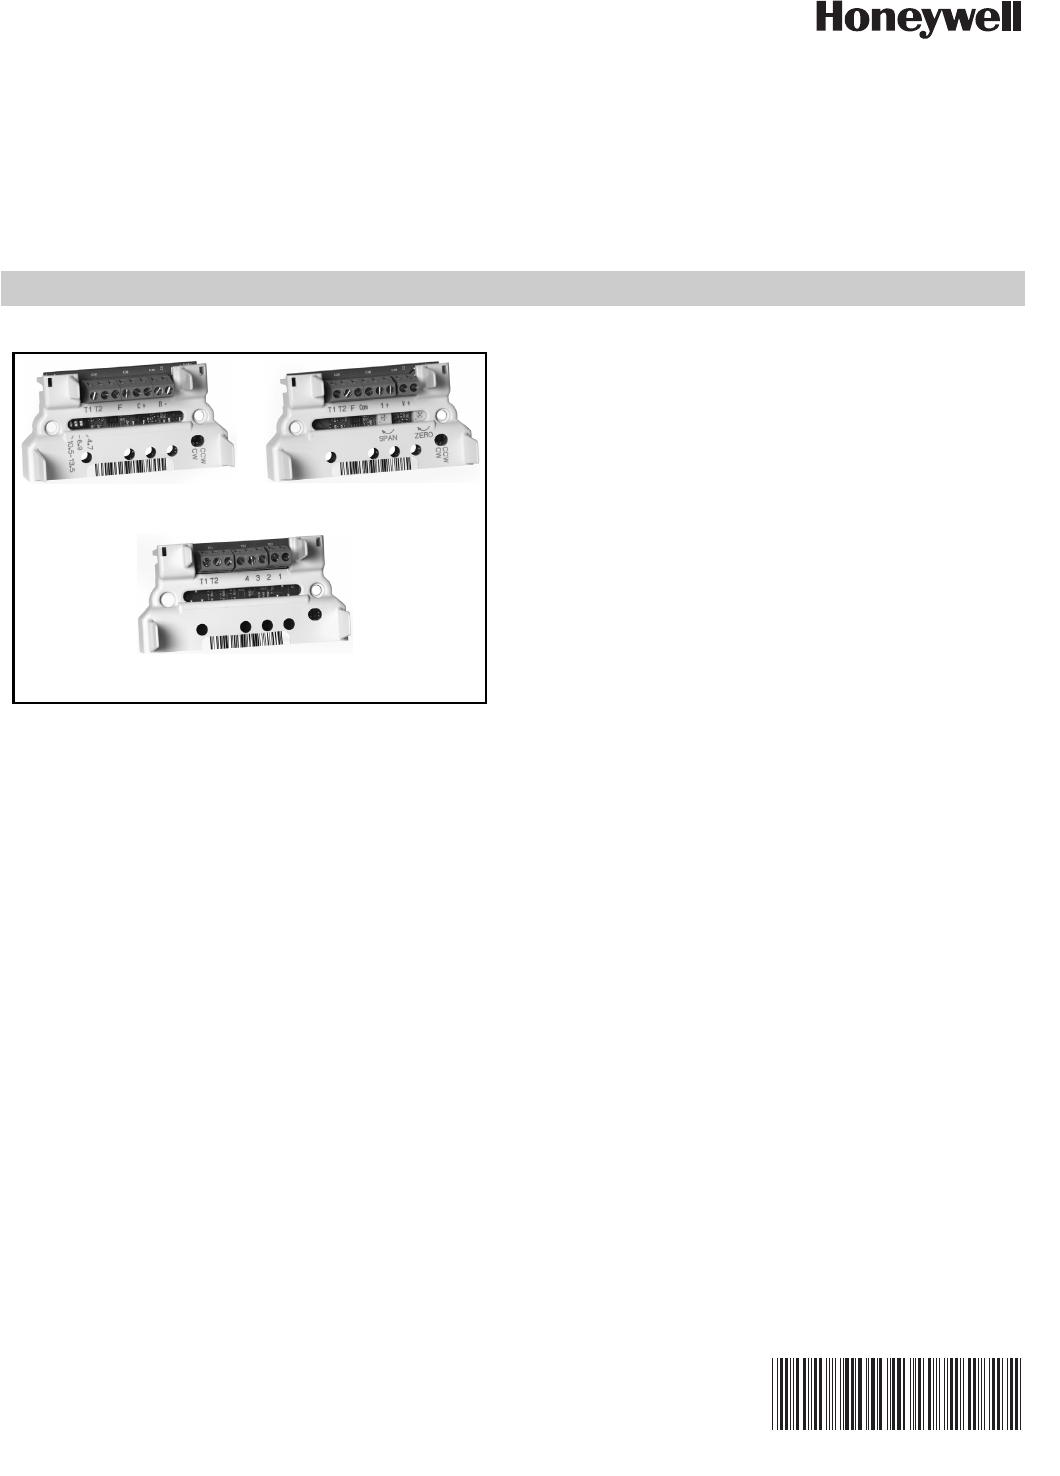 Wunderbar Glowire Helm Fotos - Schaltplan Serie Circuit Collection ...